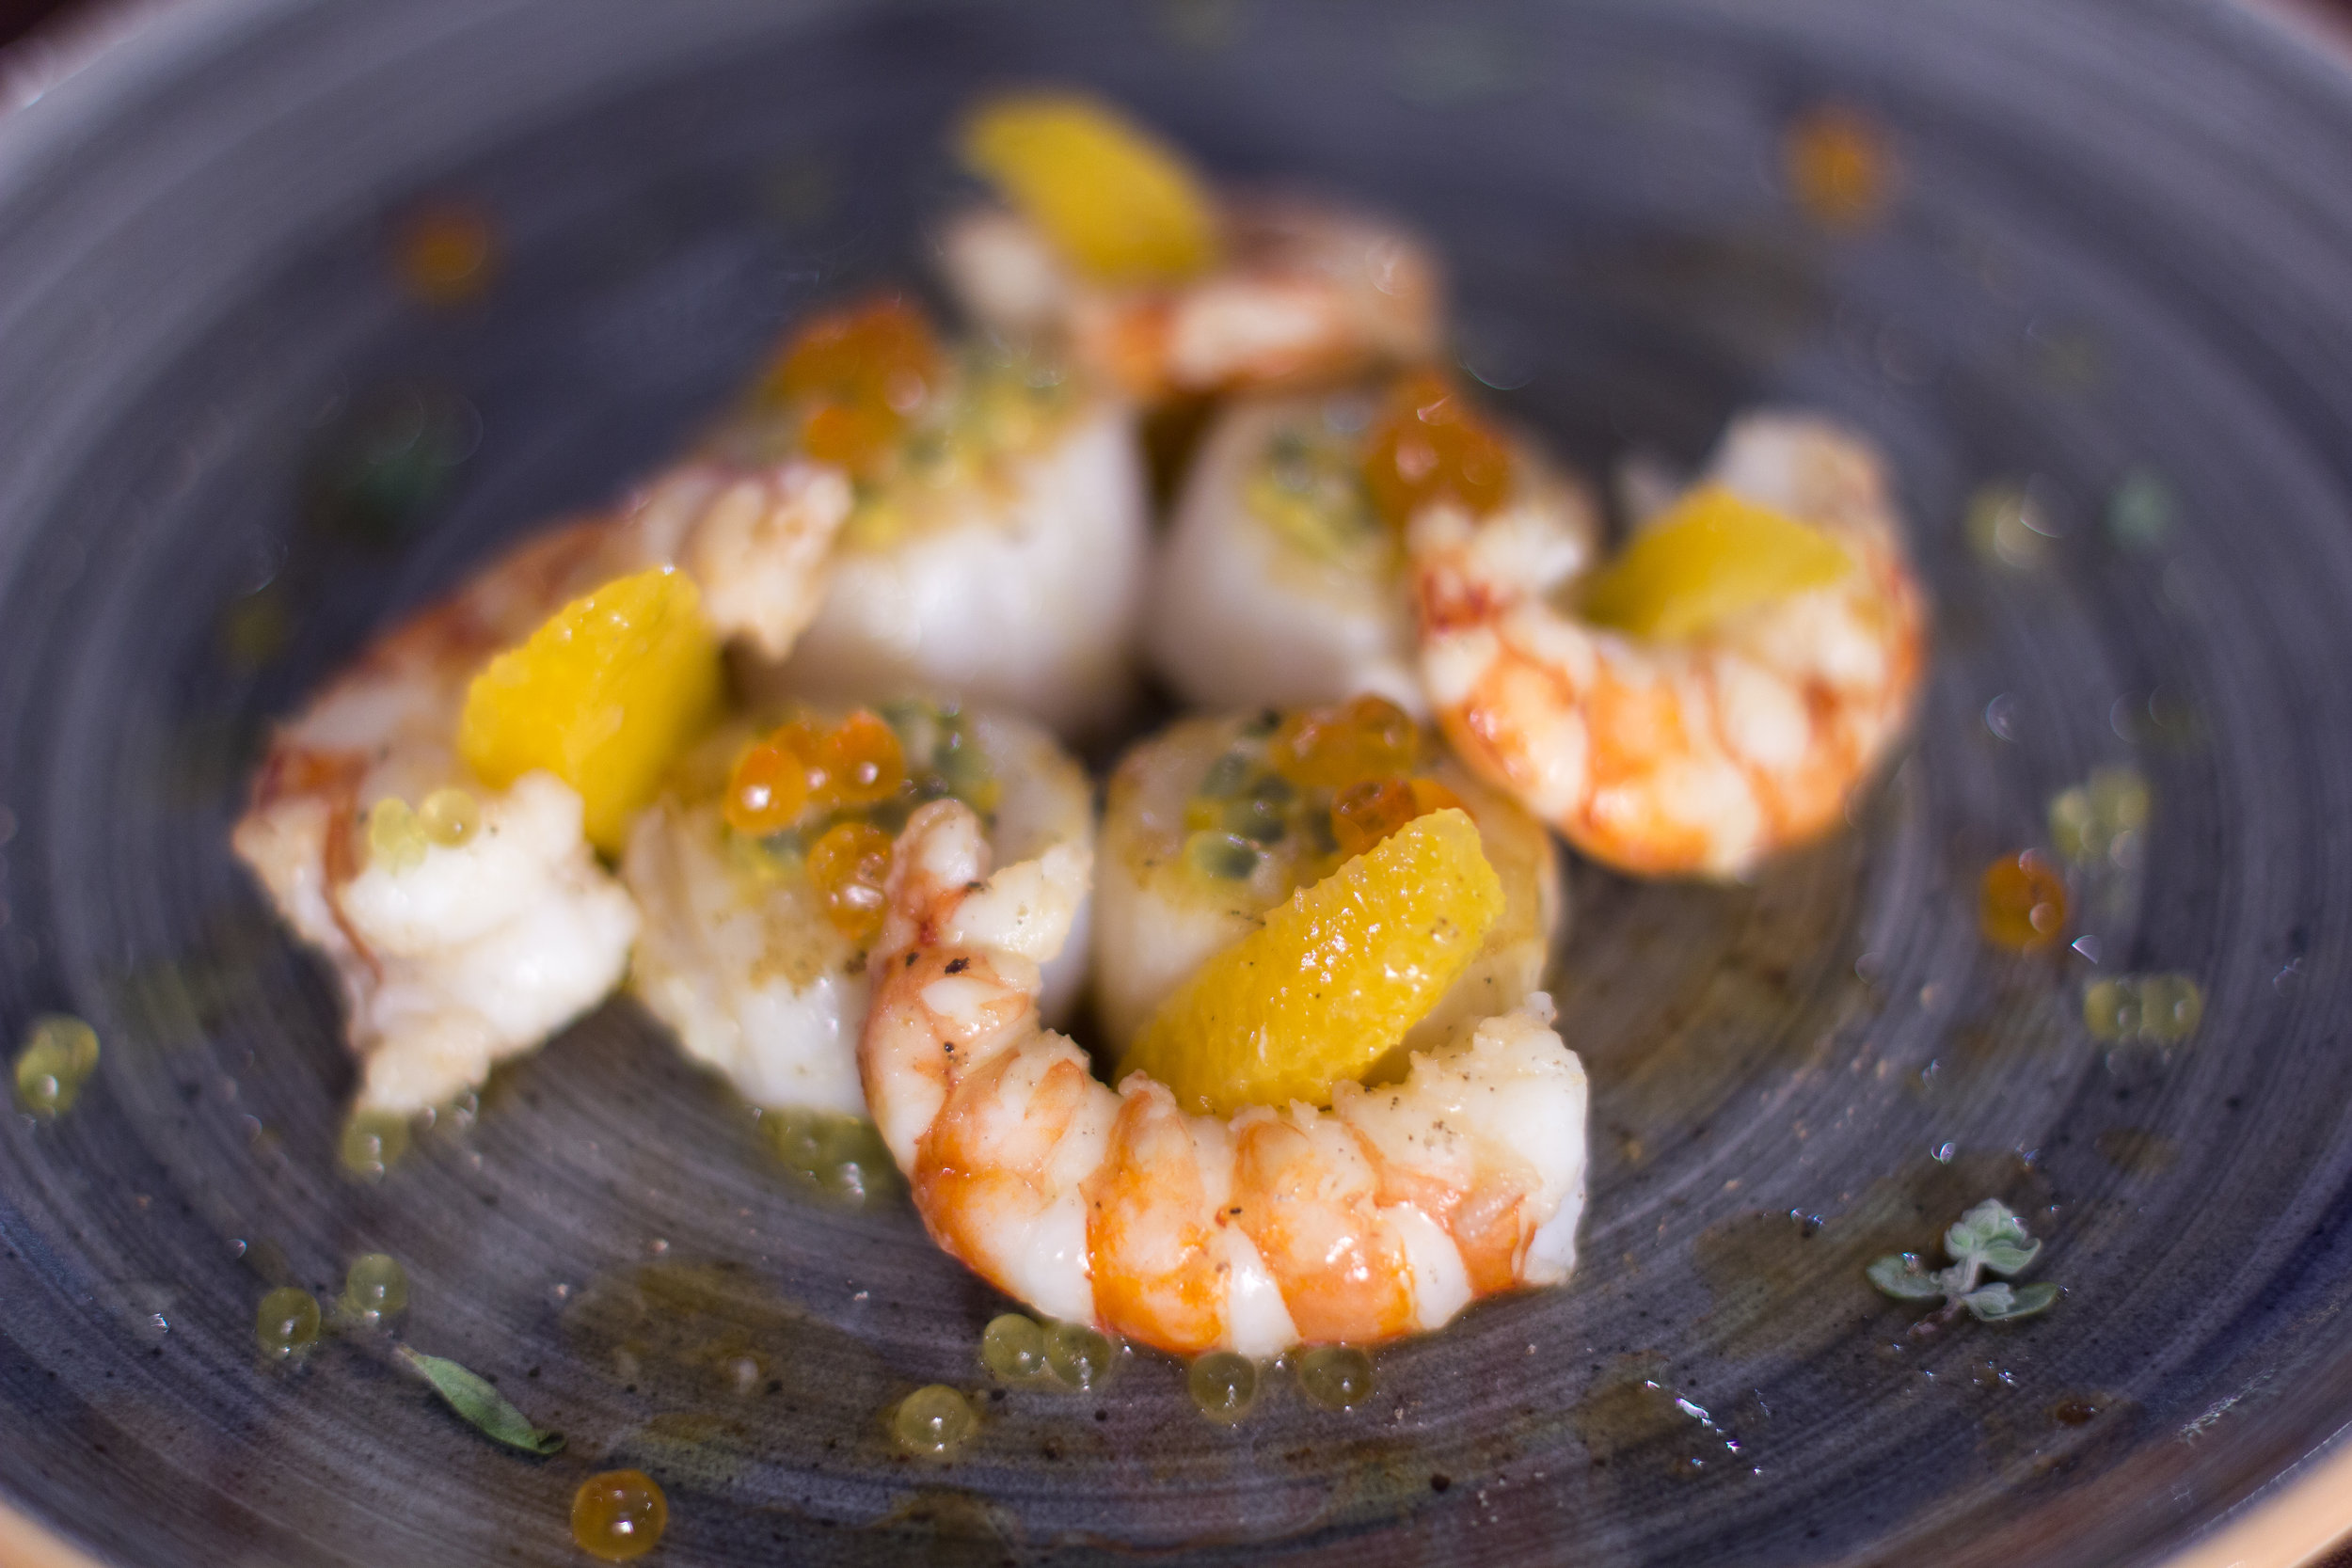 fotografo food chef still life